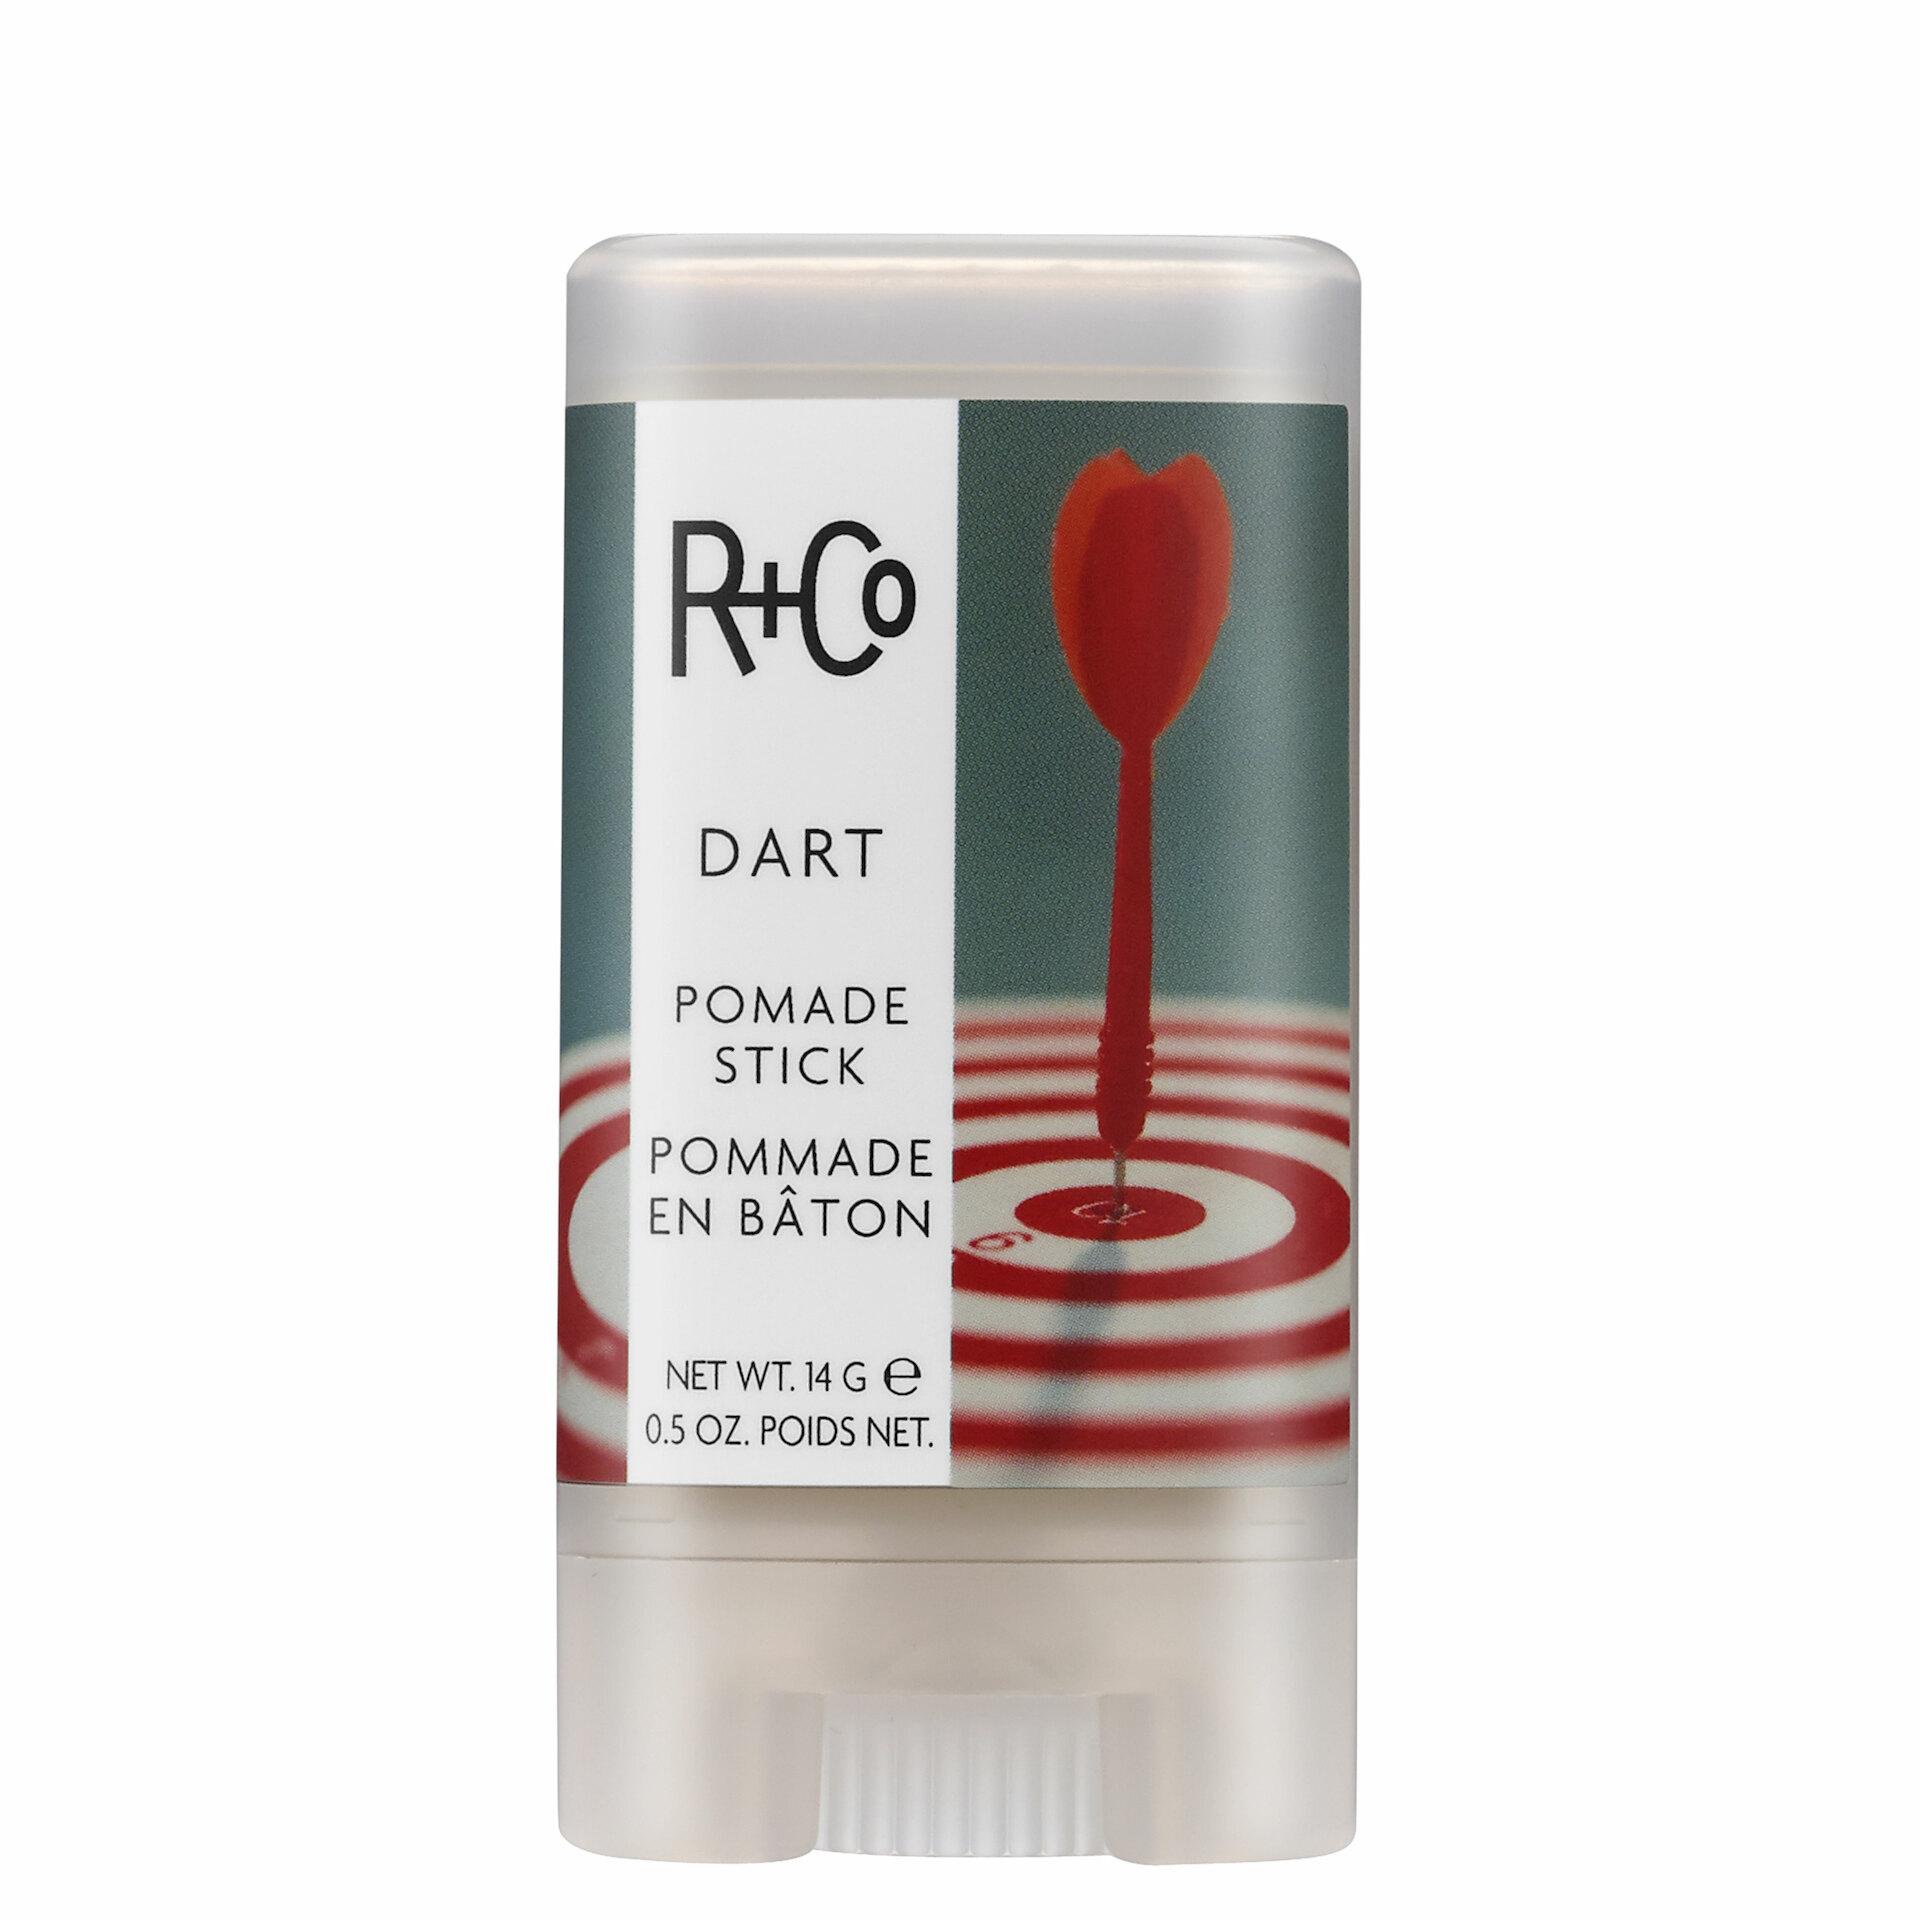 R+Co DART Pomade Stick DART Pomade Stick